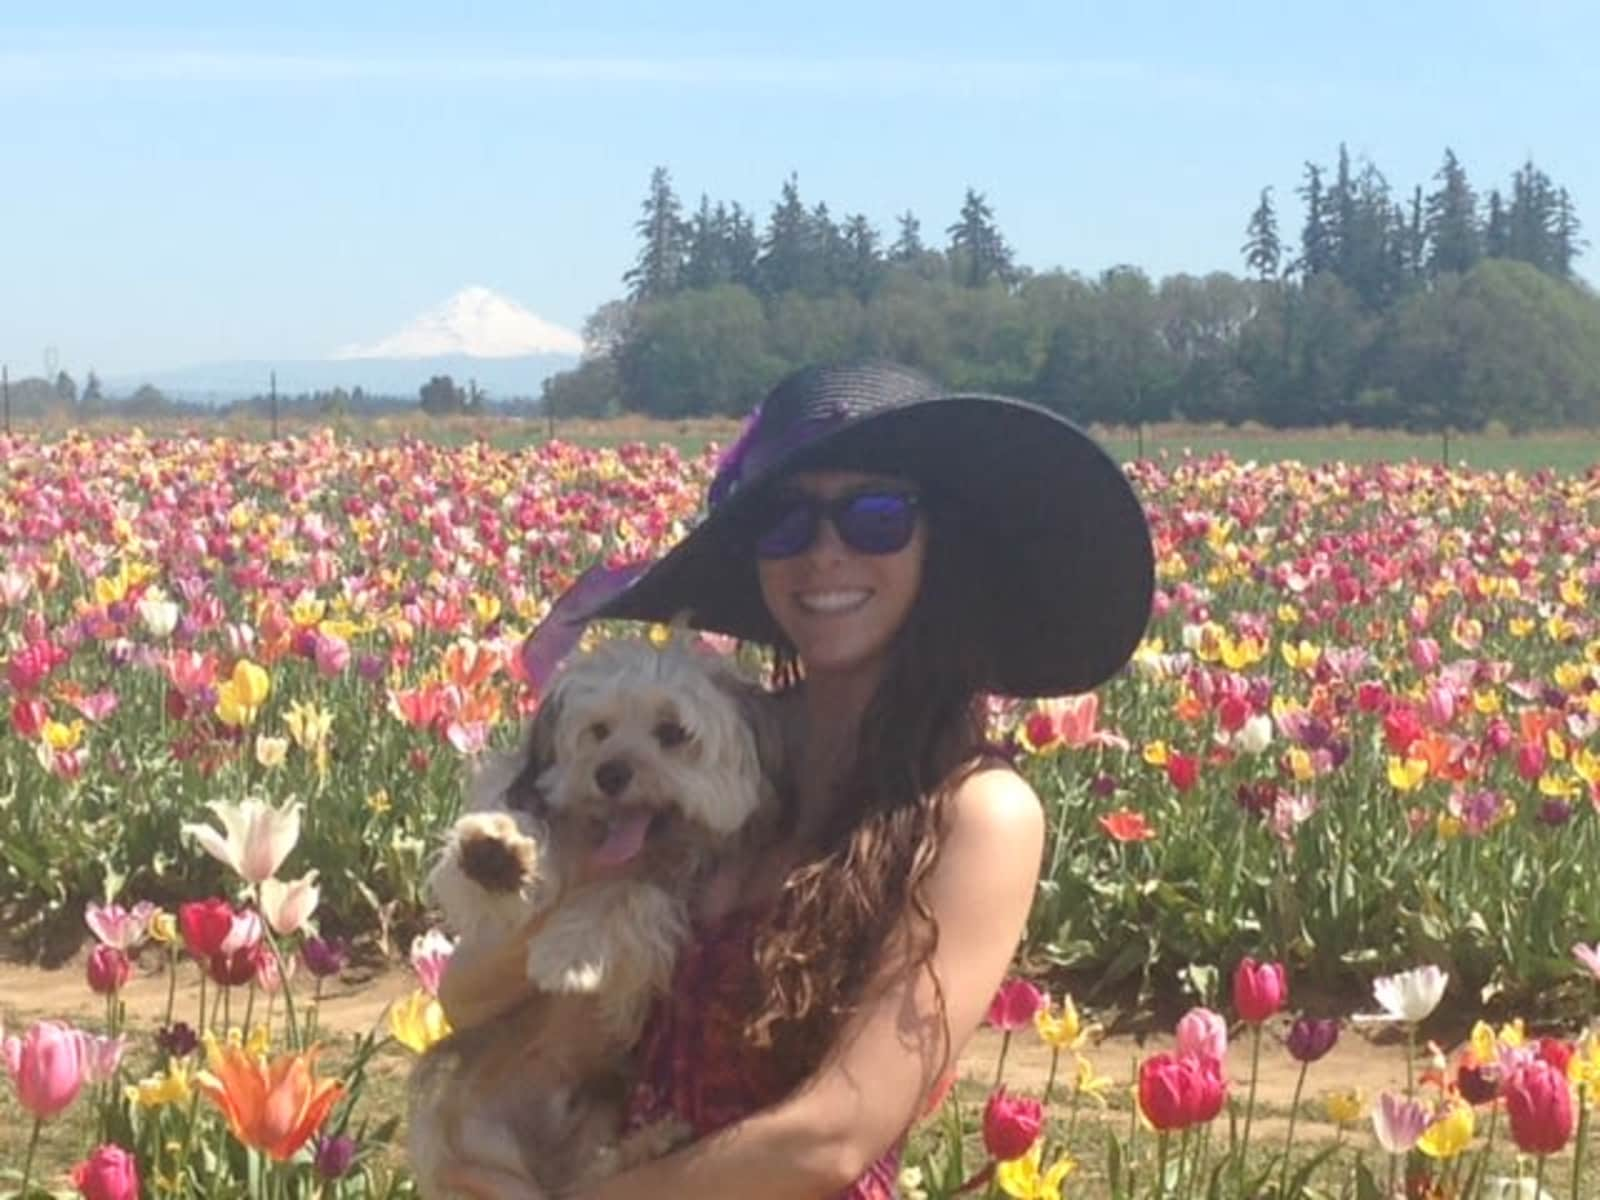 Erin rebecca from Portland, Oregon, United States